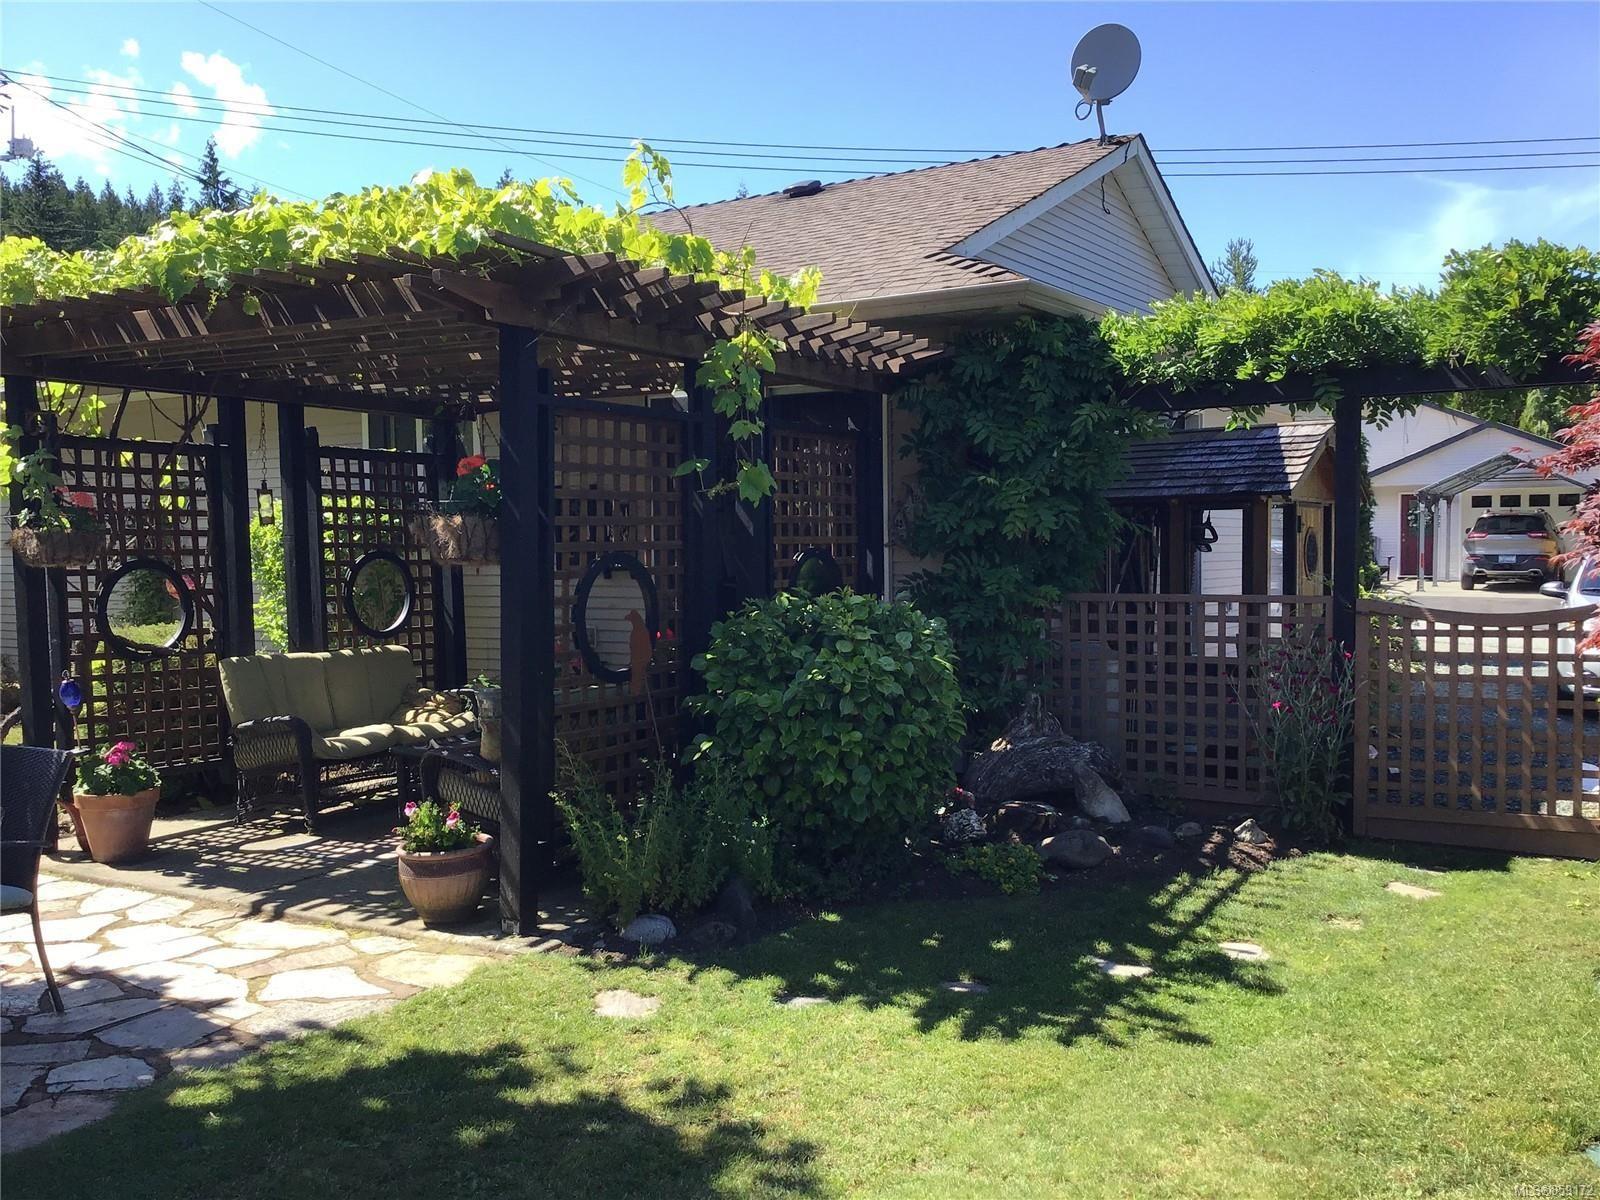 Photo 13: Photos: 1723 Karen's Crt in : PQ Qualicum North House for sale (Parksville/Qualicum)  : MLS®# 859172